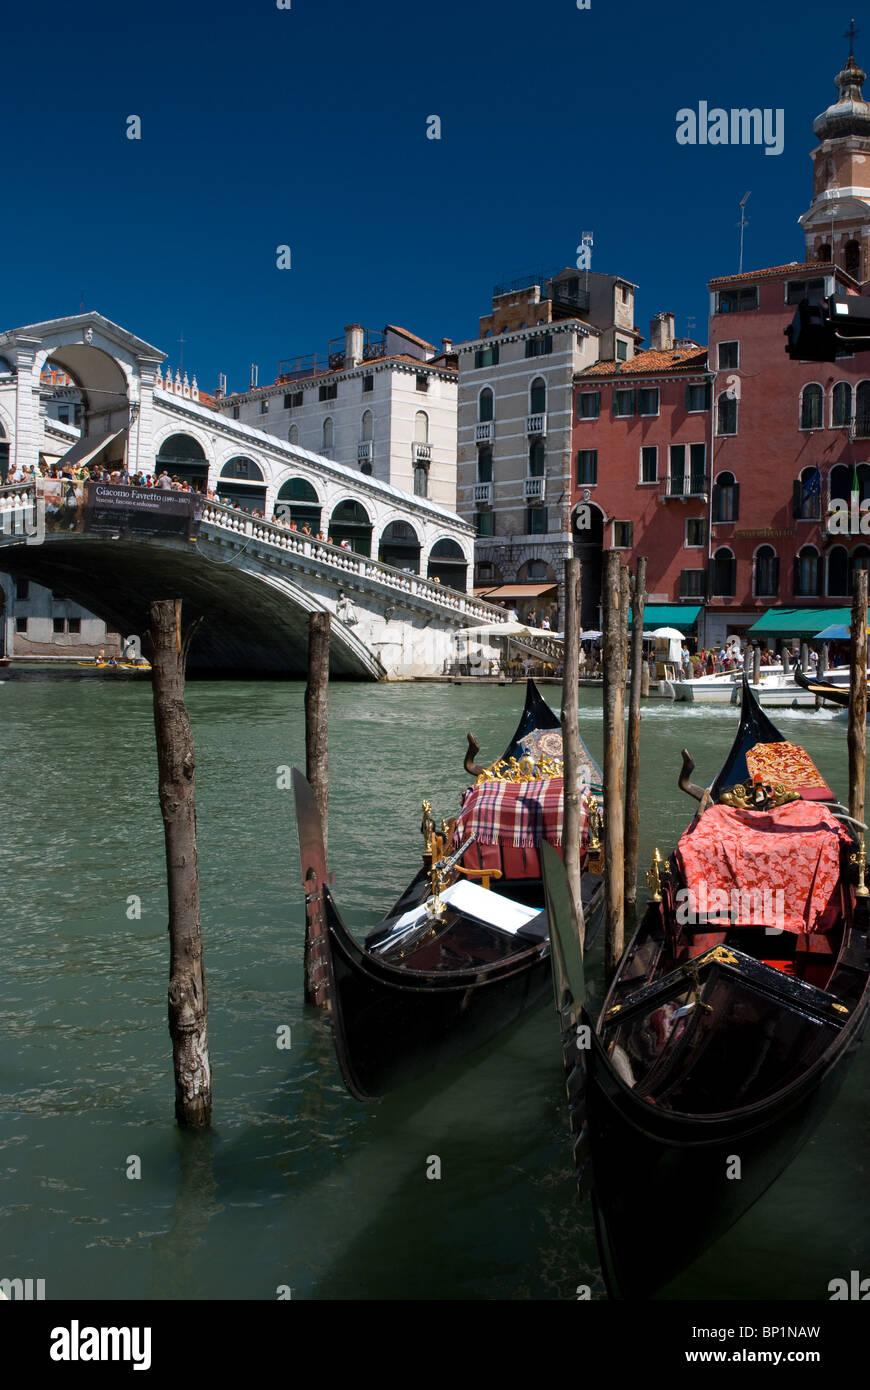 Gondolas near Riato Bridge, Venice, Italy - Stock Image